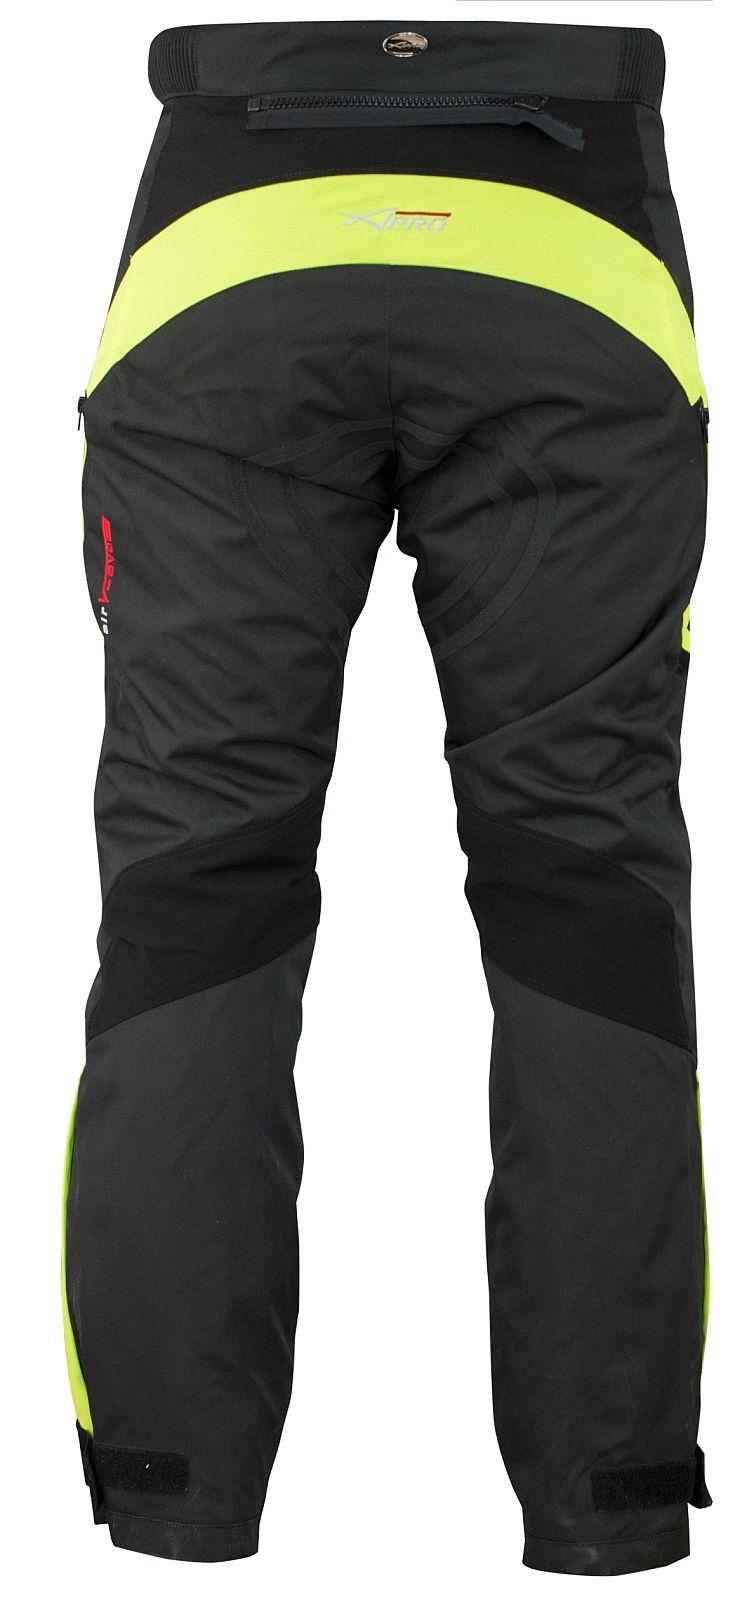 Pantaloni-Donna-Impermeabile-Moto-Imbottitura-Termica-Traspirante-Fluo miniature 7